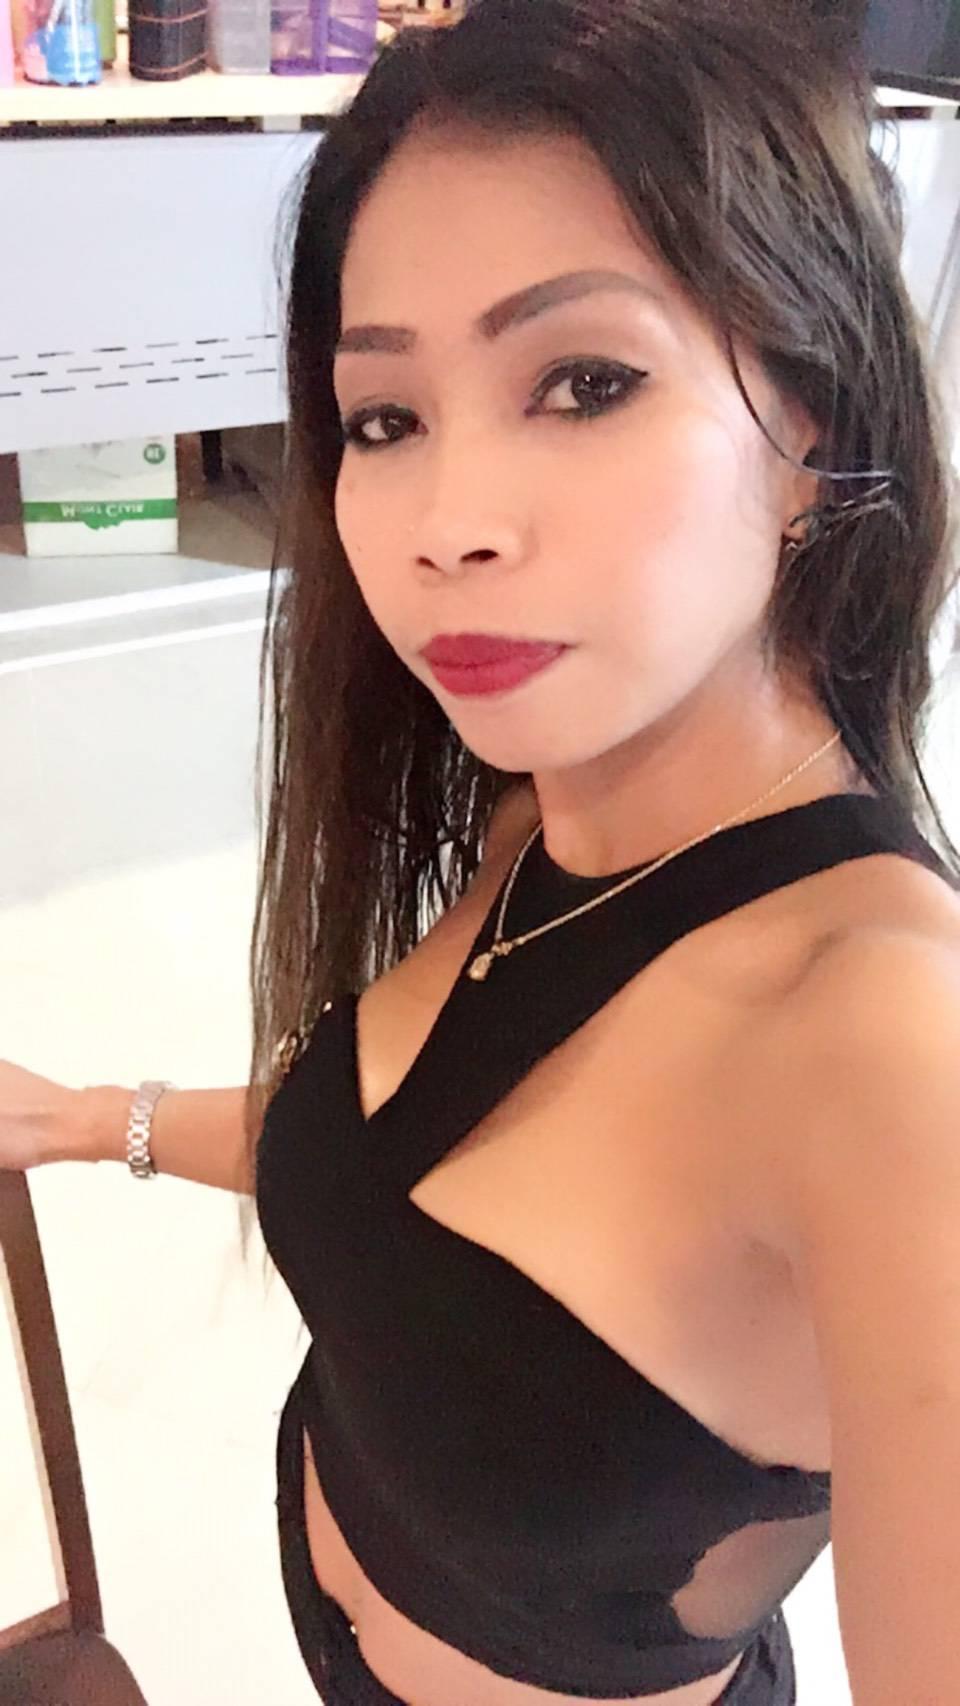 escort in thailand